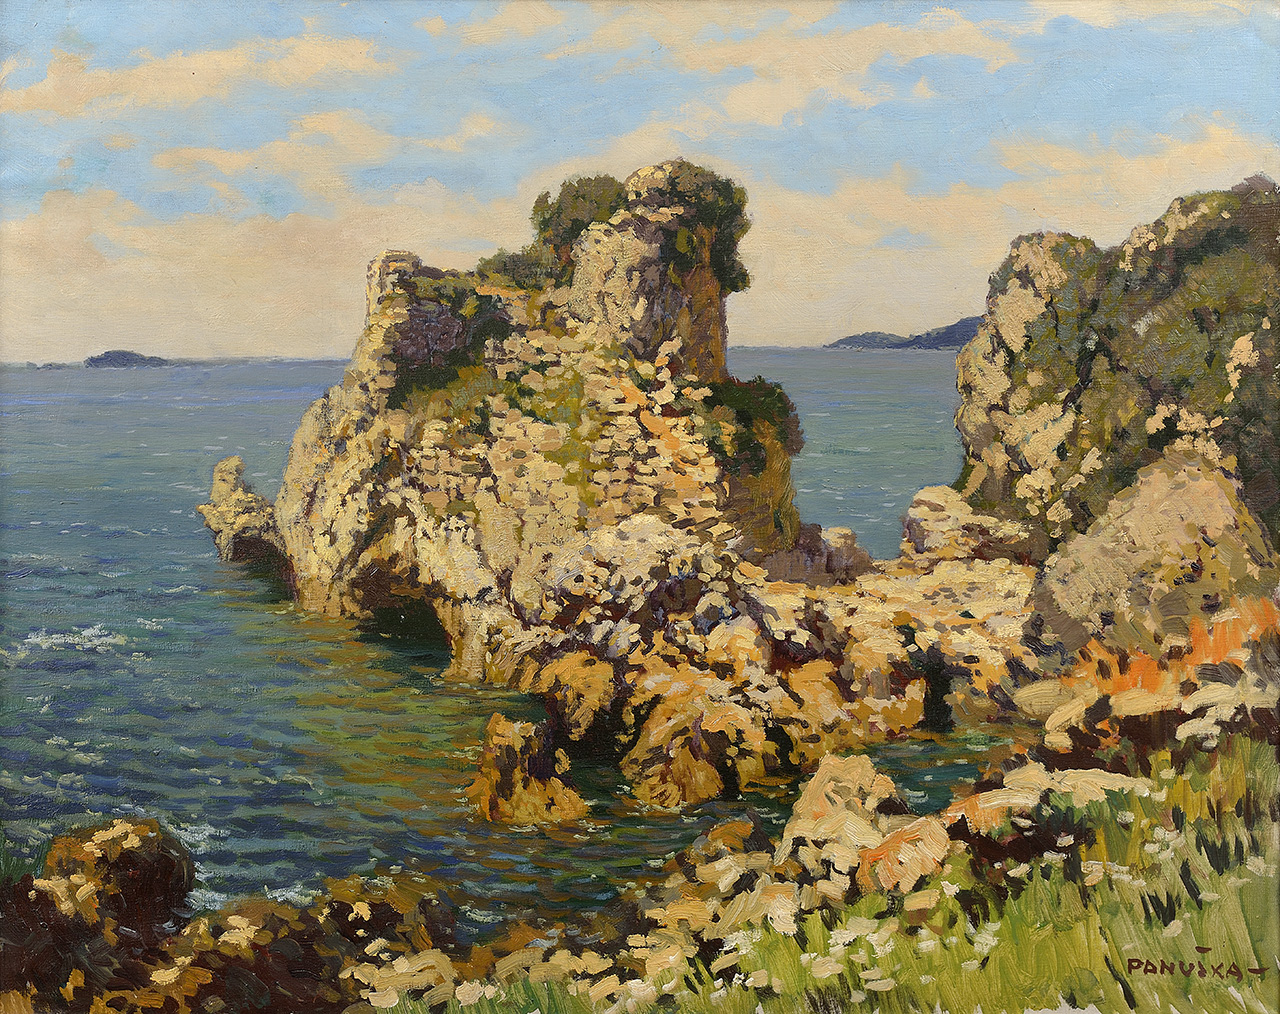 Ruins of Epidauros, oil on canvas, 19,5 × 24,5 cm, 1928–1929